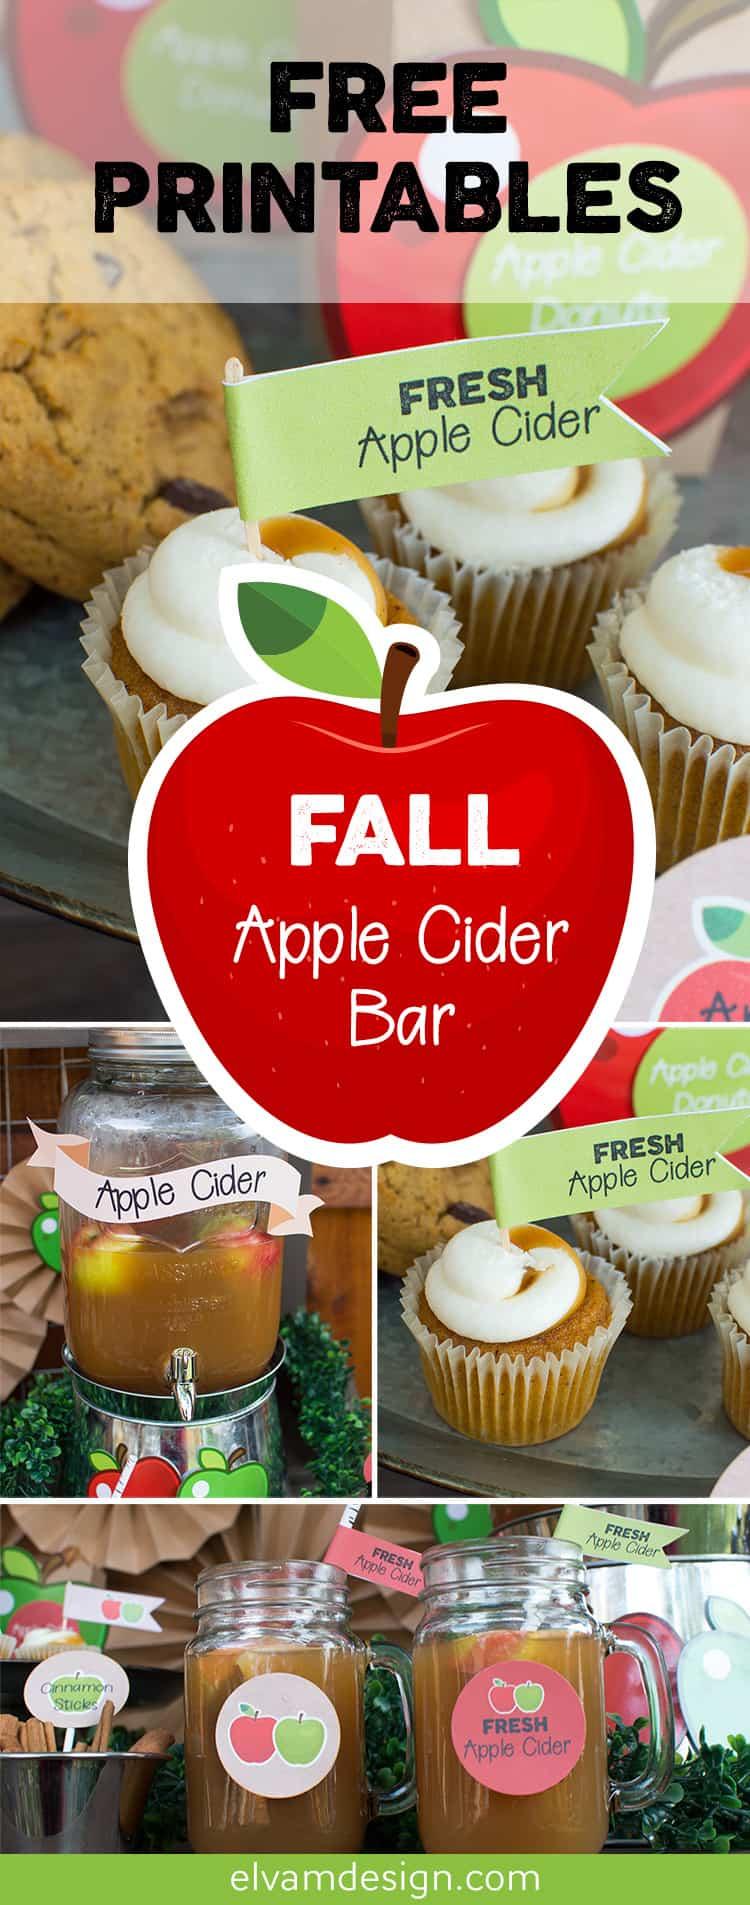 Free Fall Apple Cider Bar Printables from Elva M Design Studio